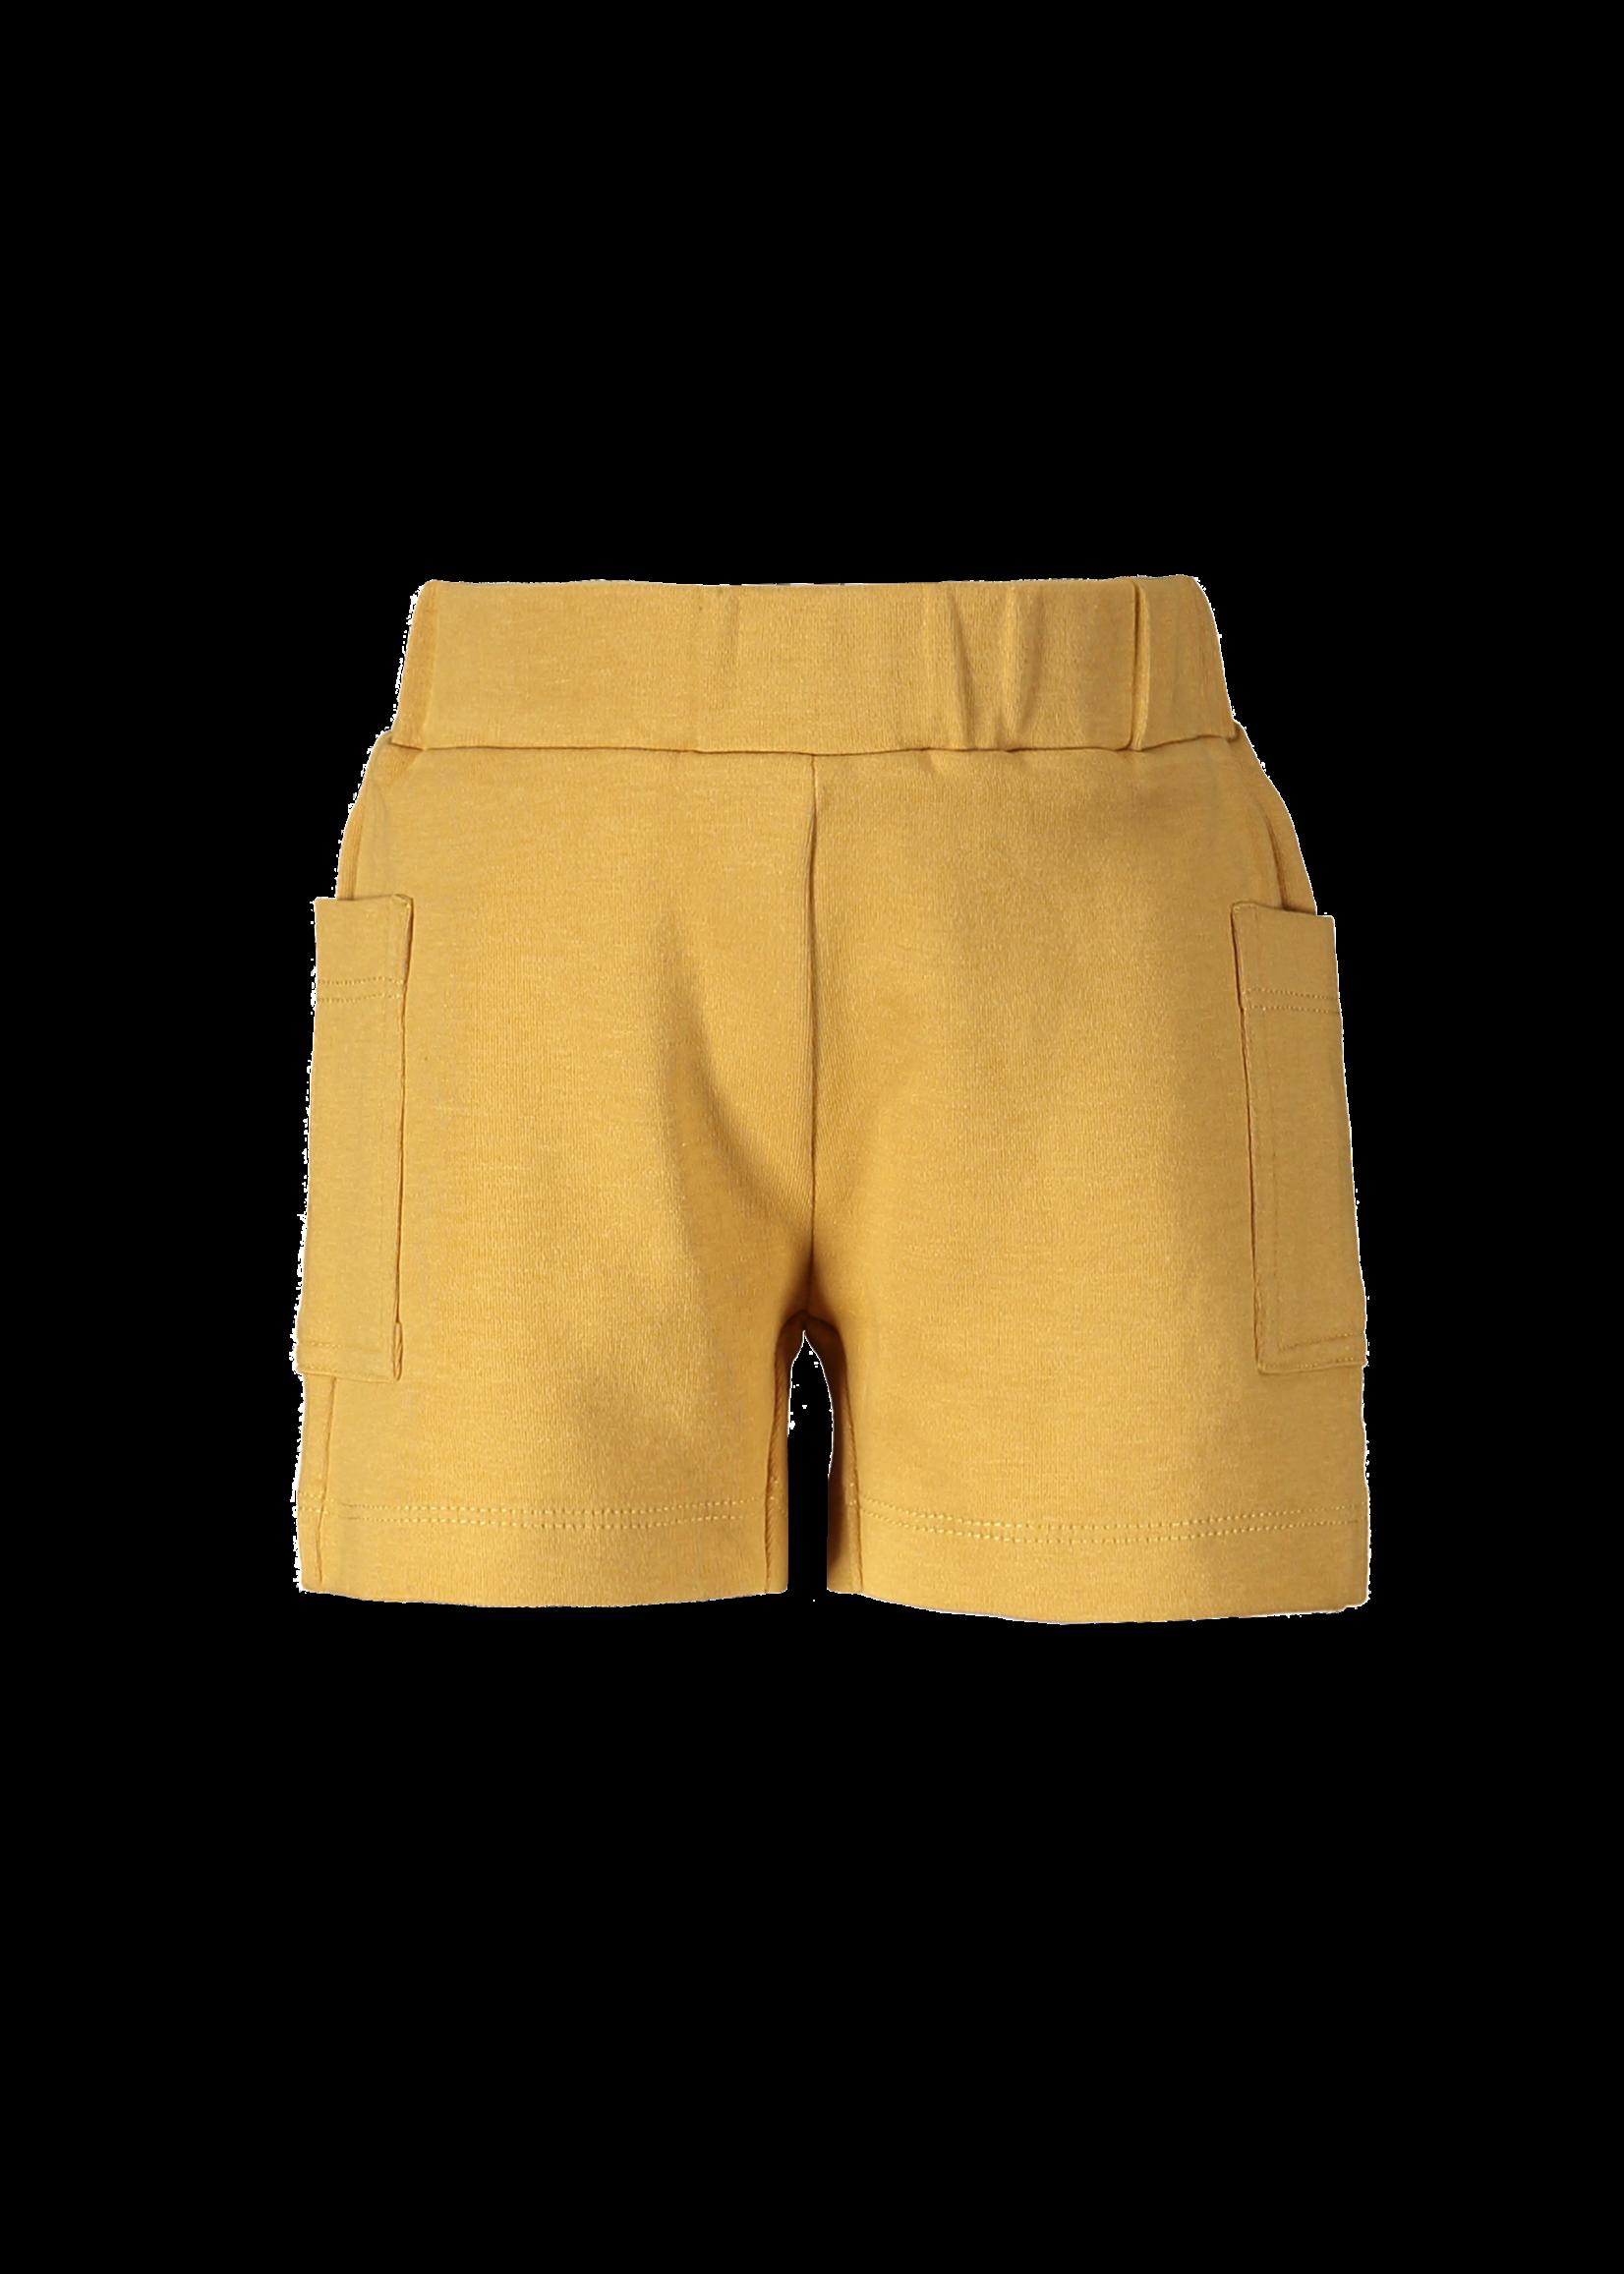 Pexi Lexi PL - Short - Cinnamon